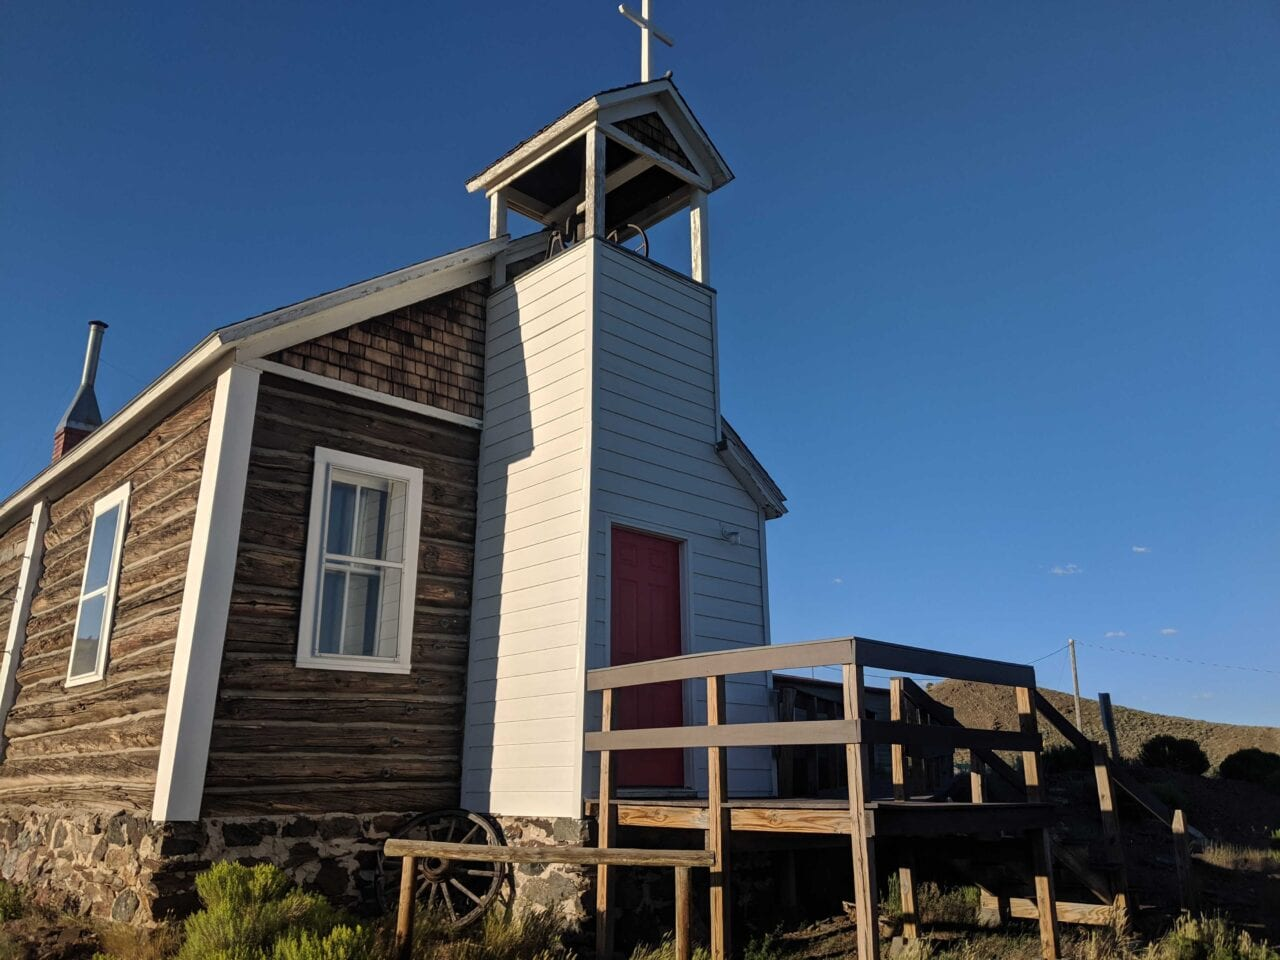 A church in Wyoming